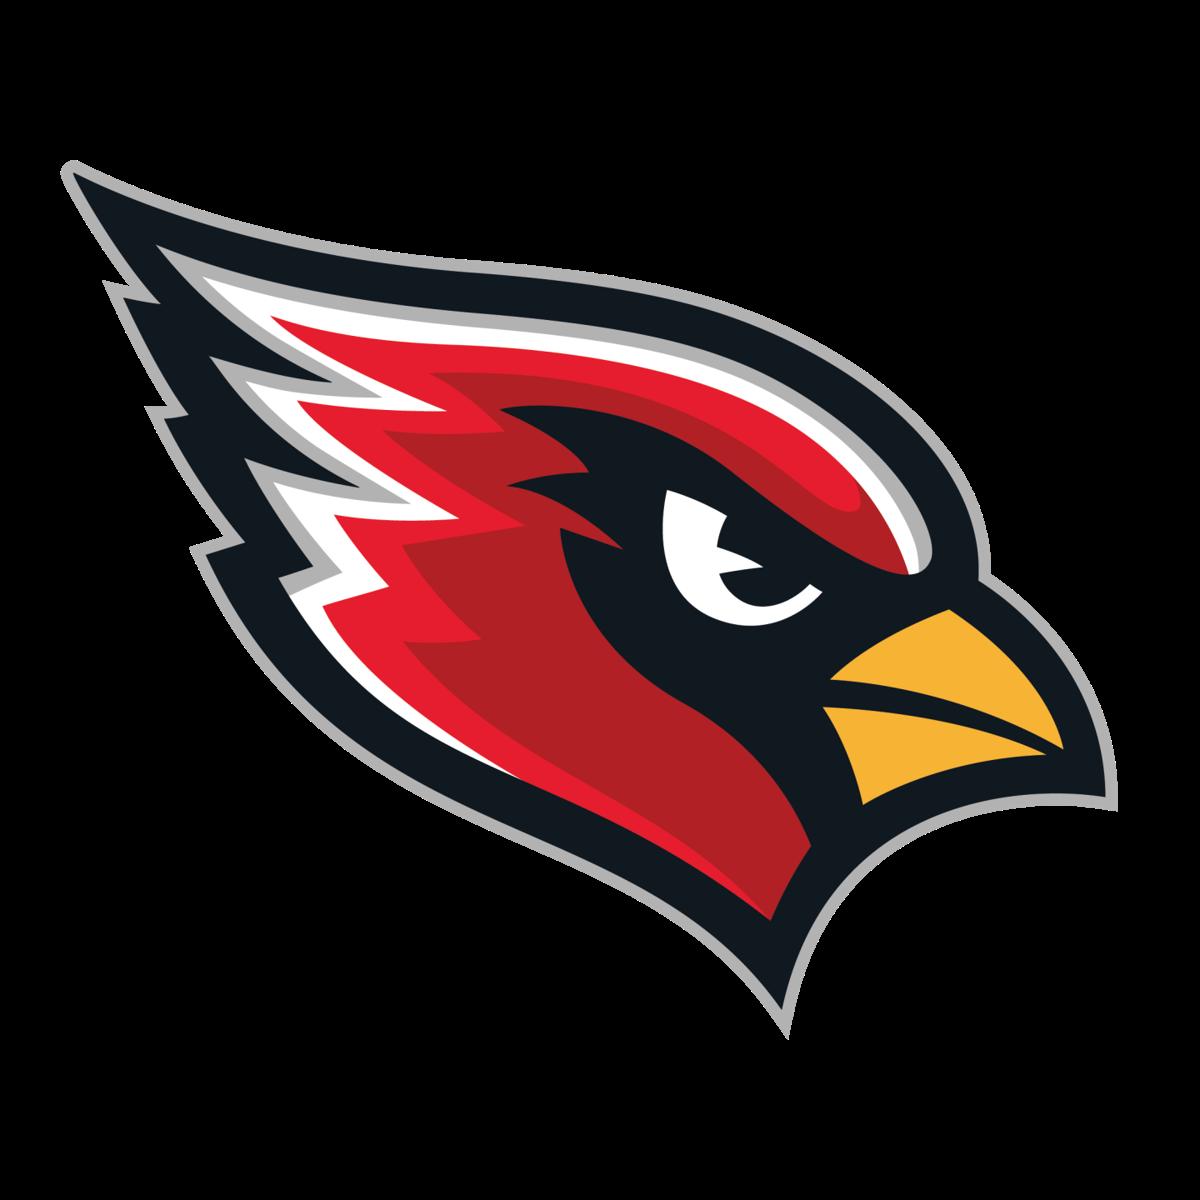 Sports_GainesvilleHSLogo_Cardinal Head-SIDE-Details.png